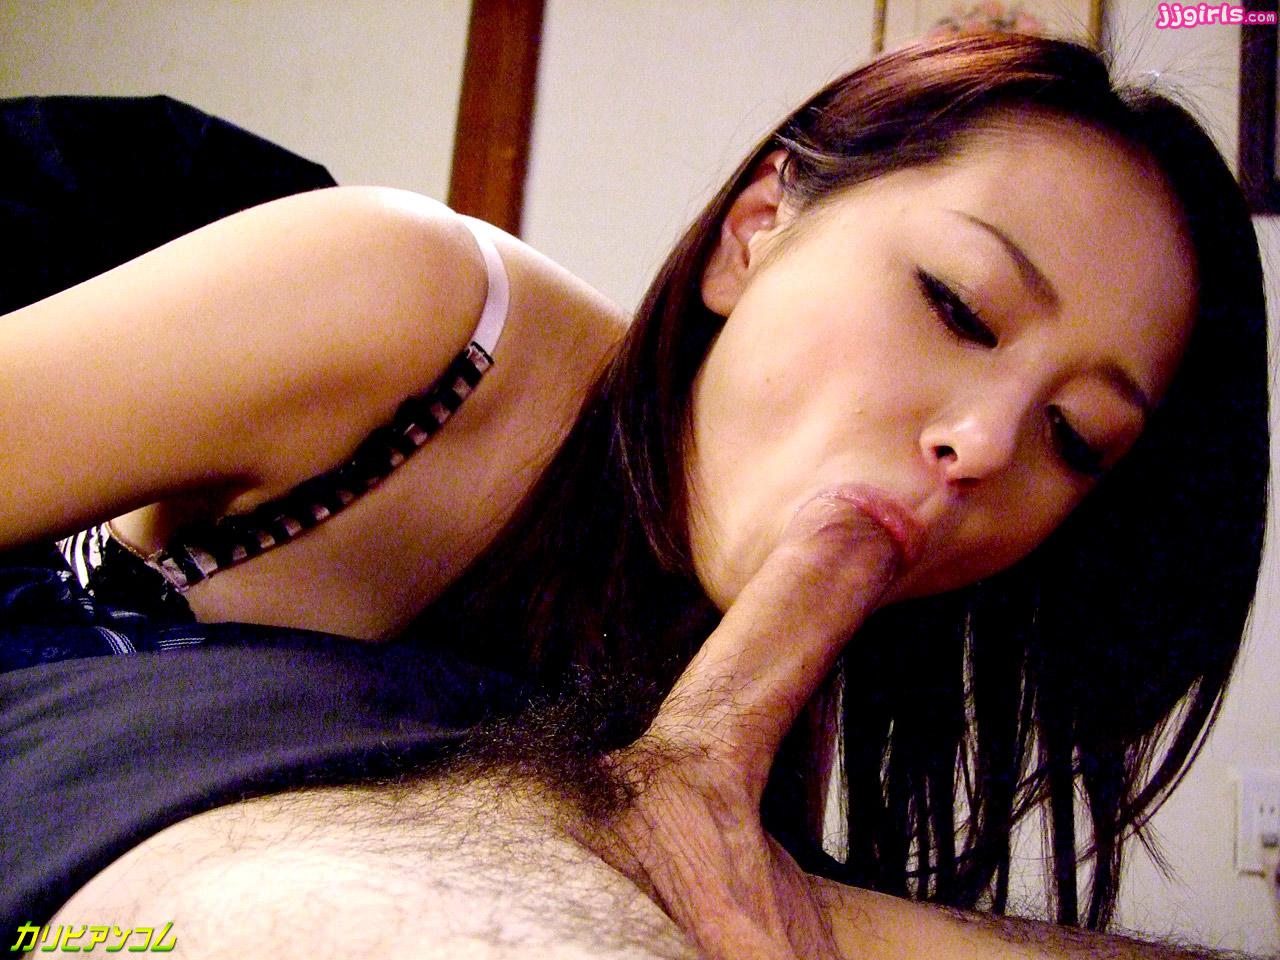 Airi pretty asian model can kiss her own tits 6